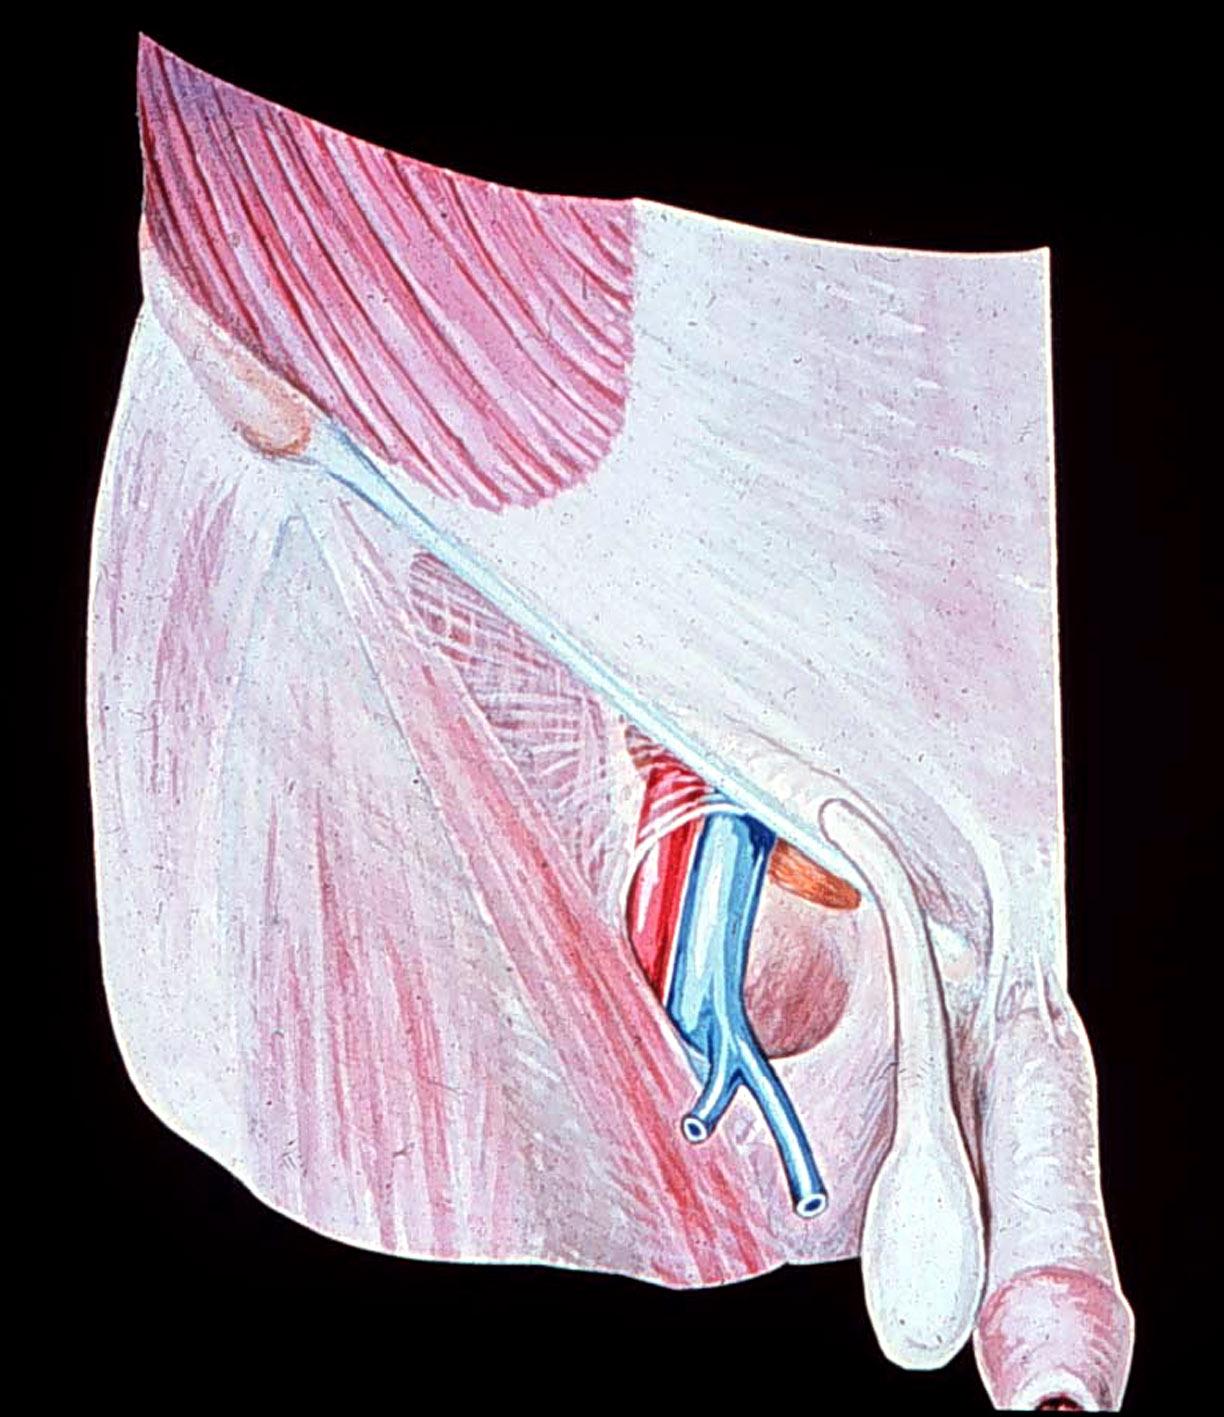 femorale liesbreuk